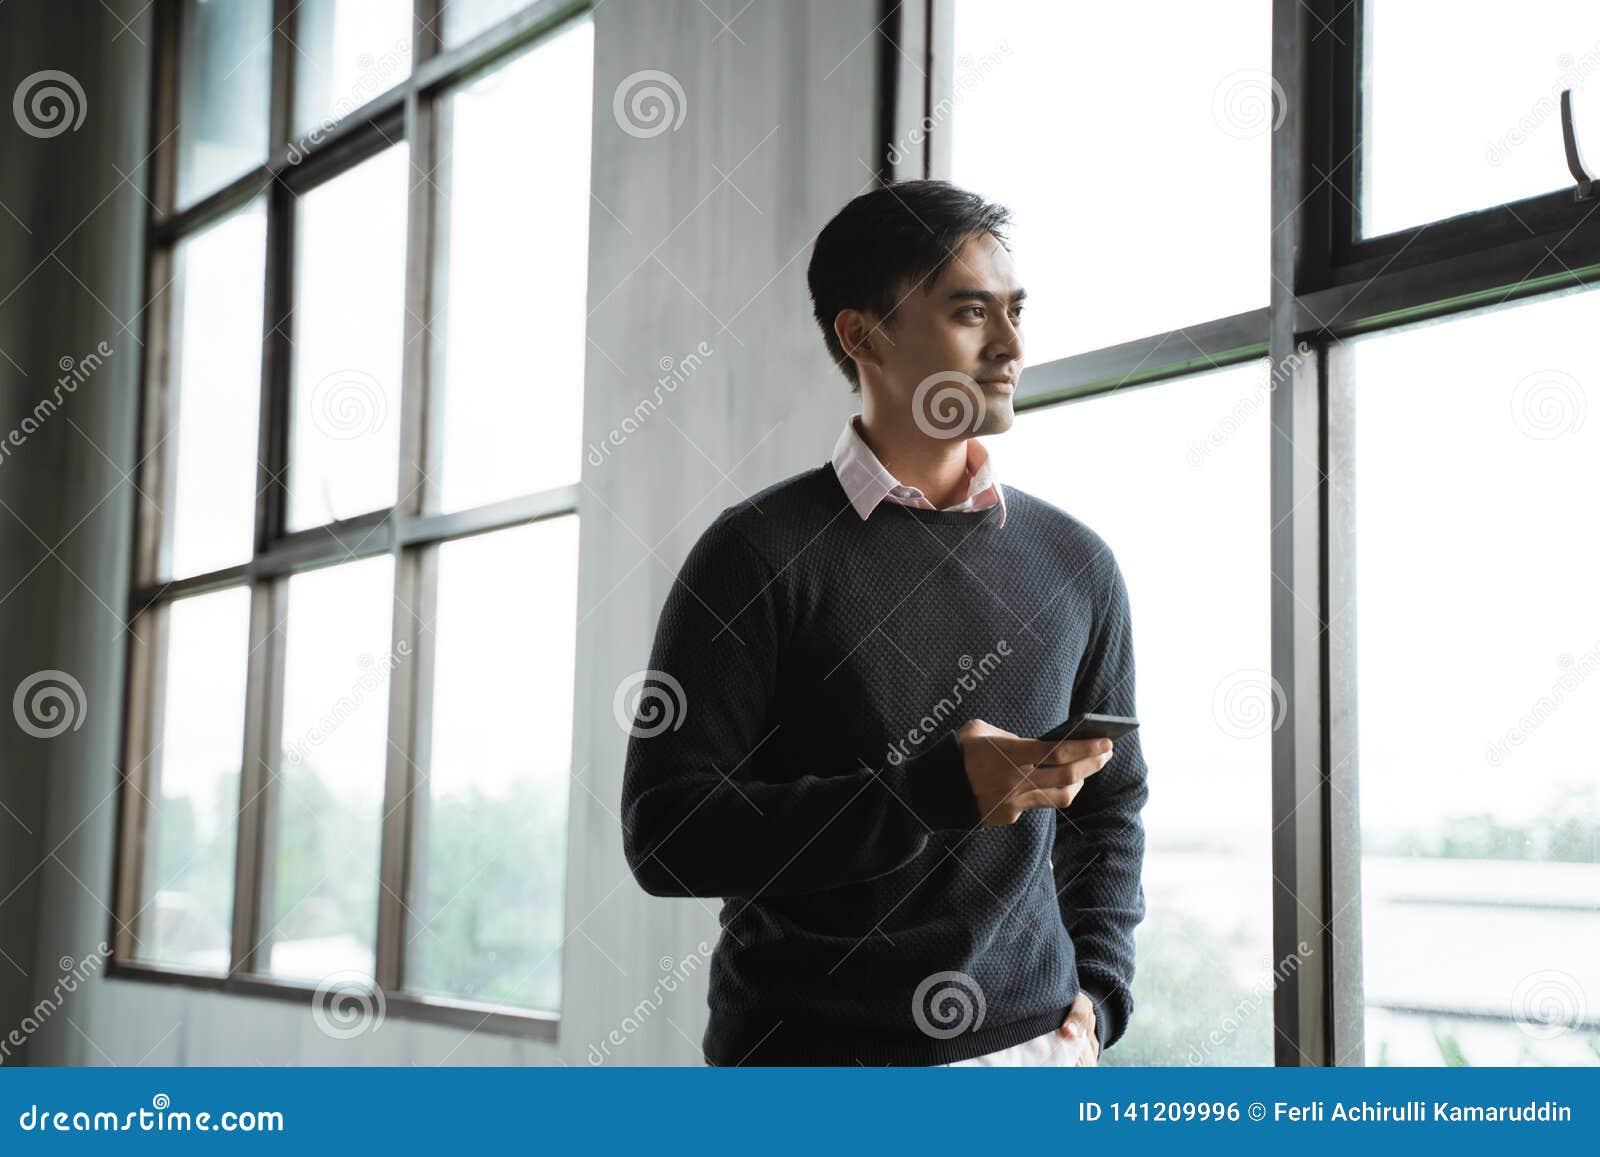 Hombre de negocios joven confiado que usa el teléfono celular